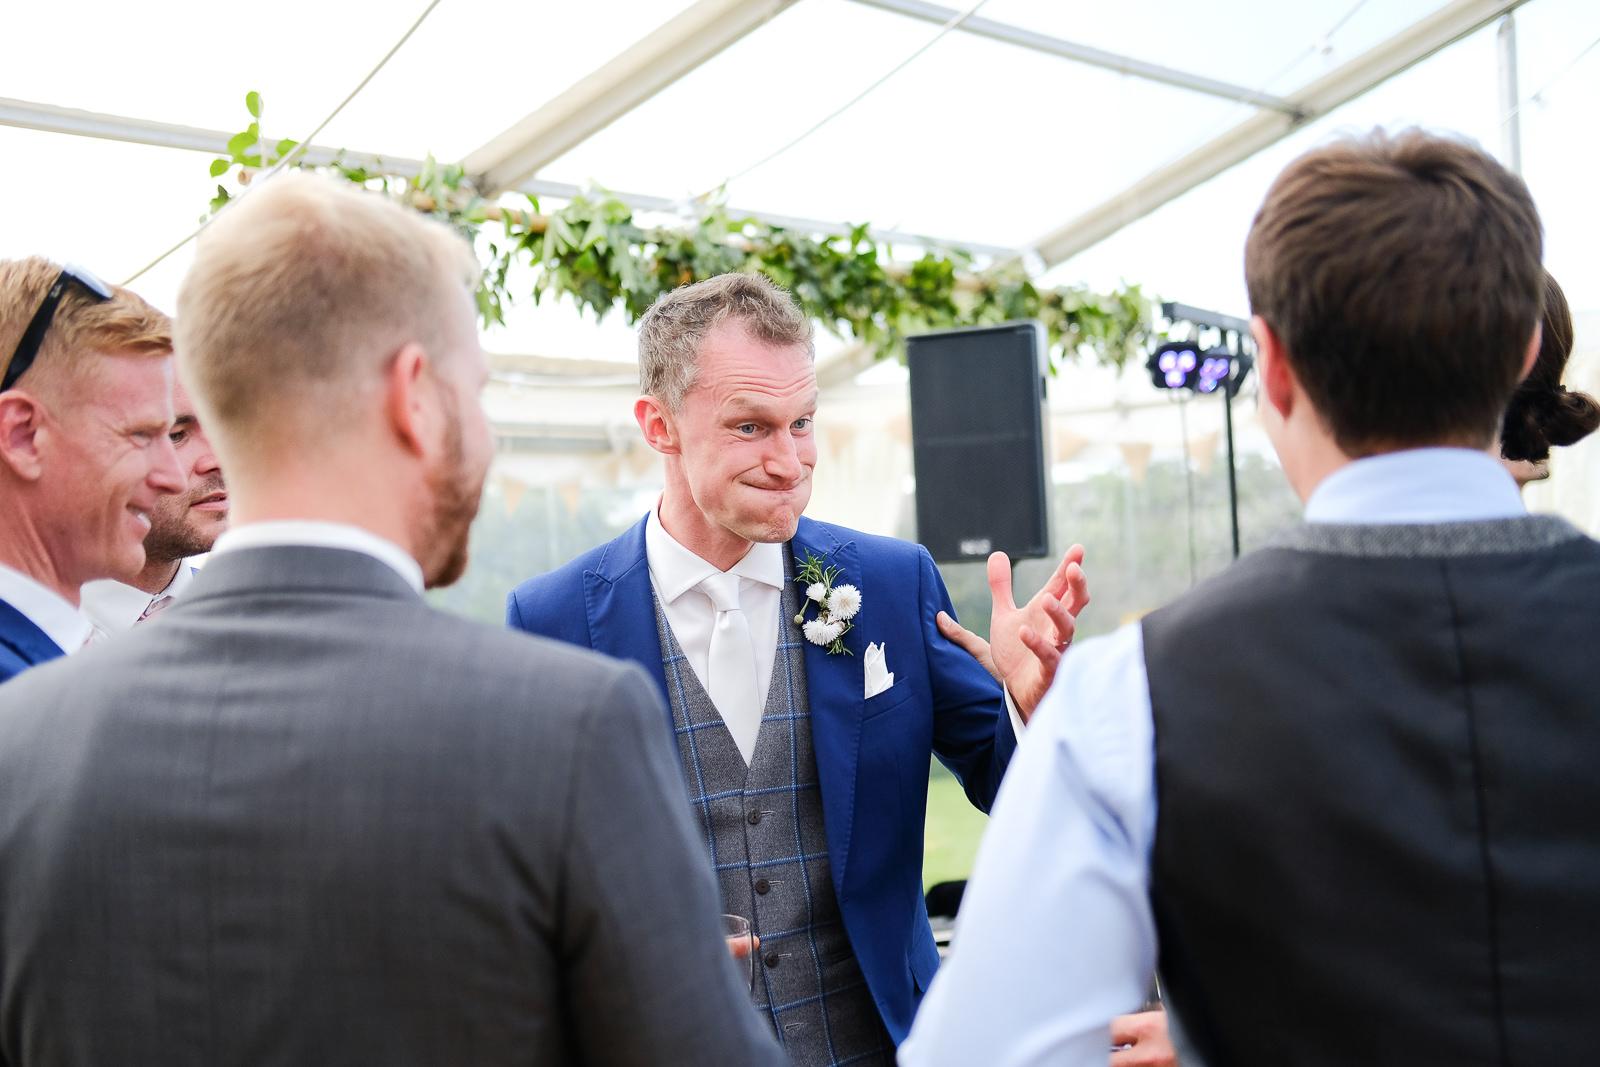 Roscarrock Farm wedding in Cornwall 070.jpg